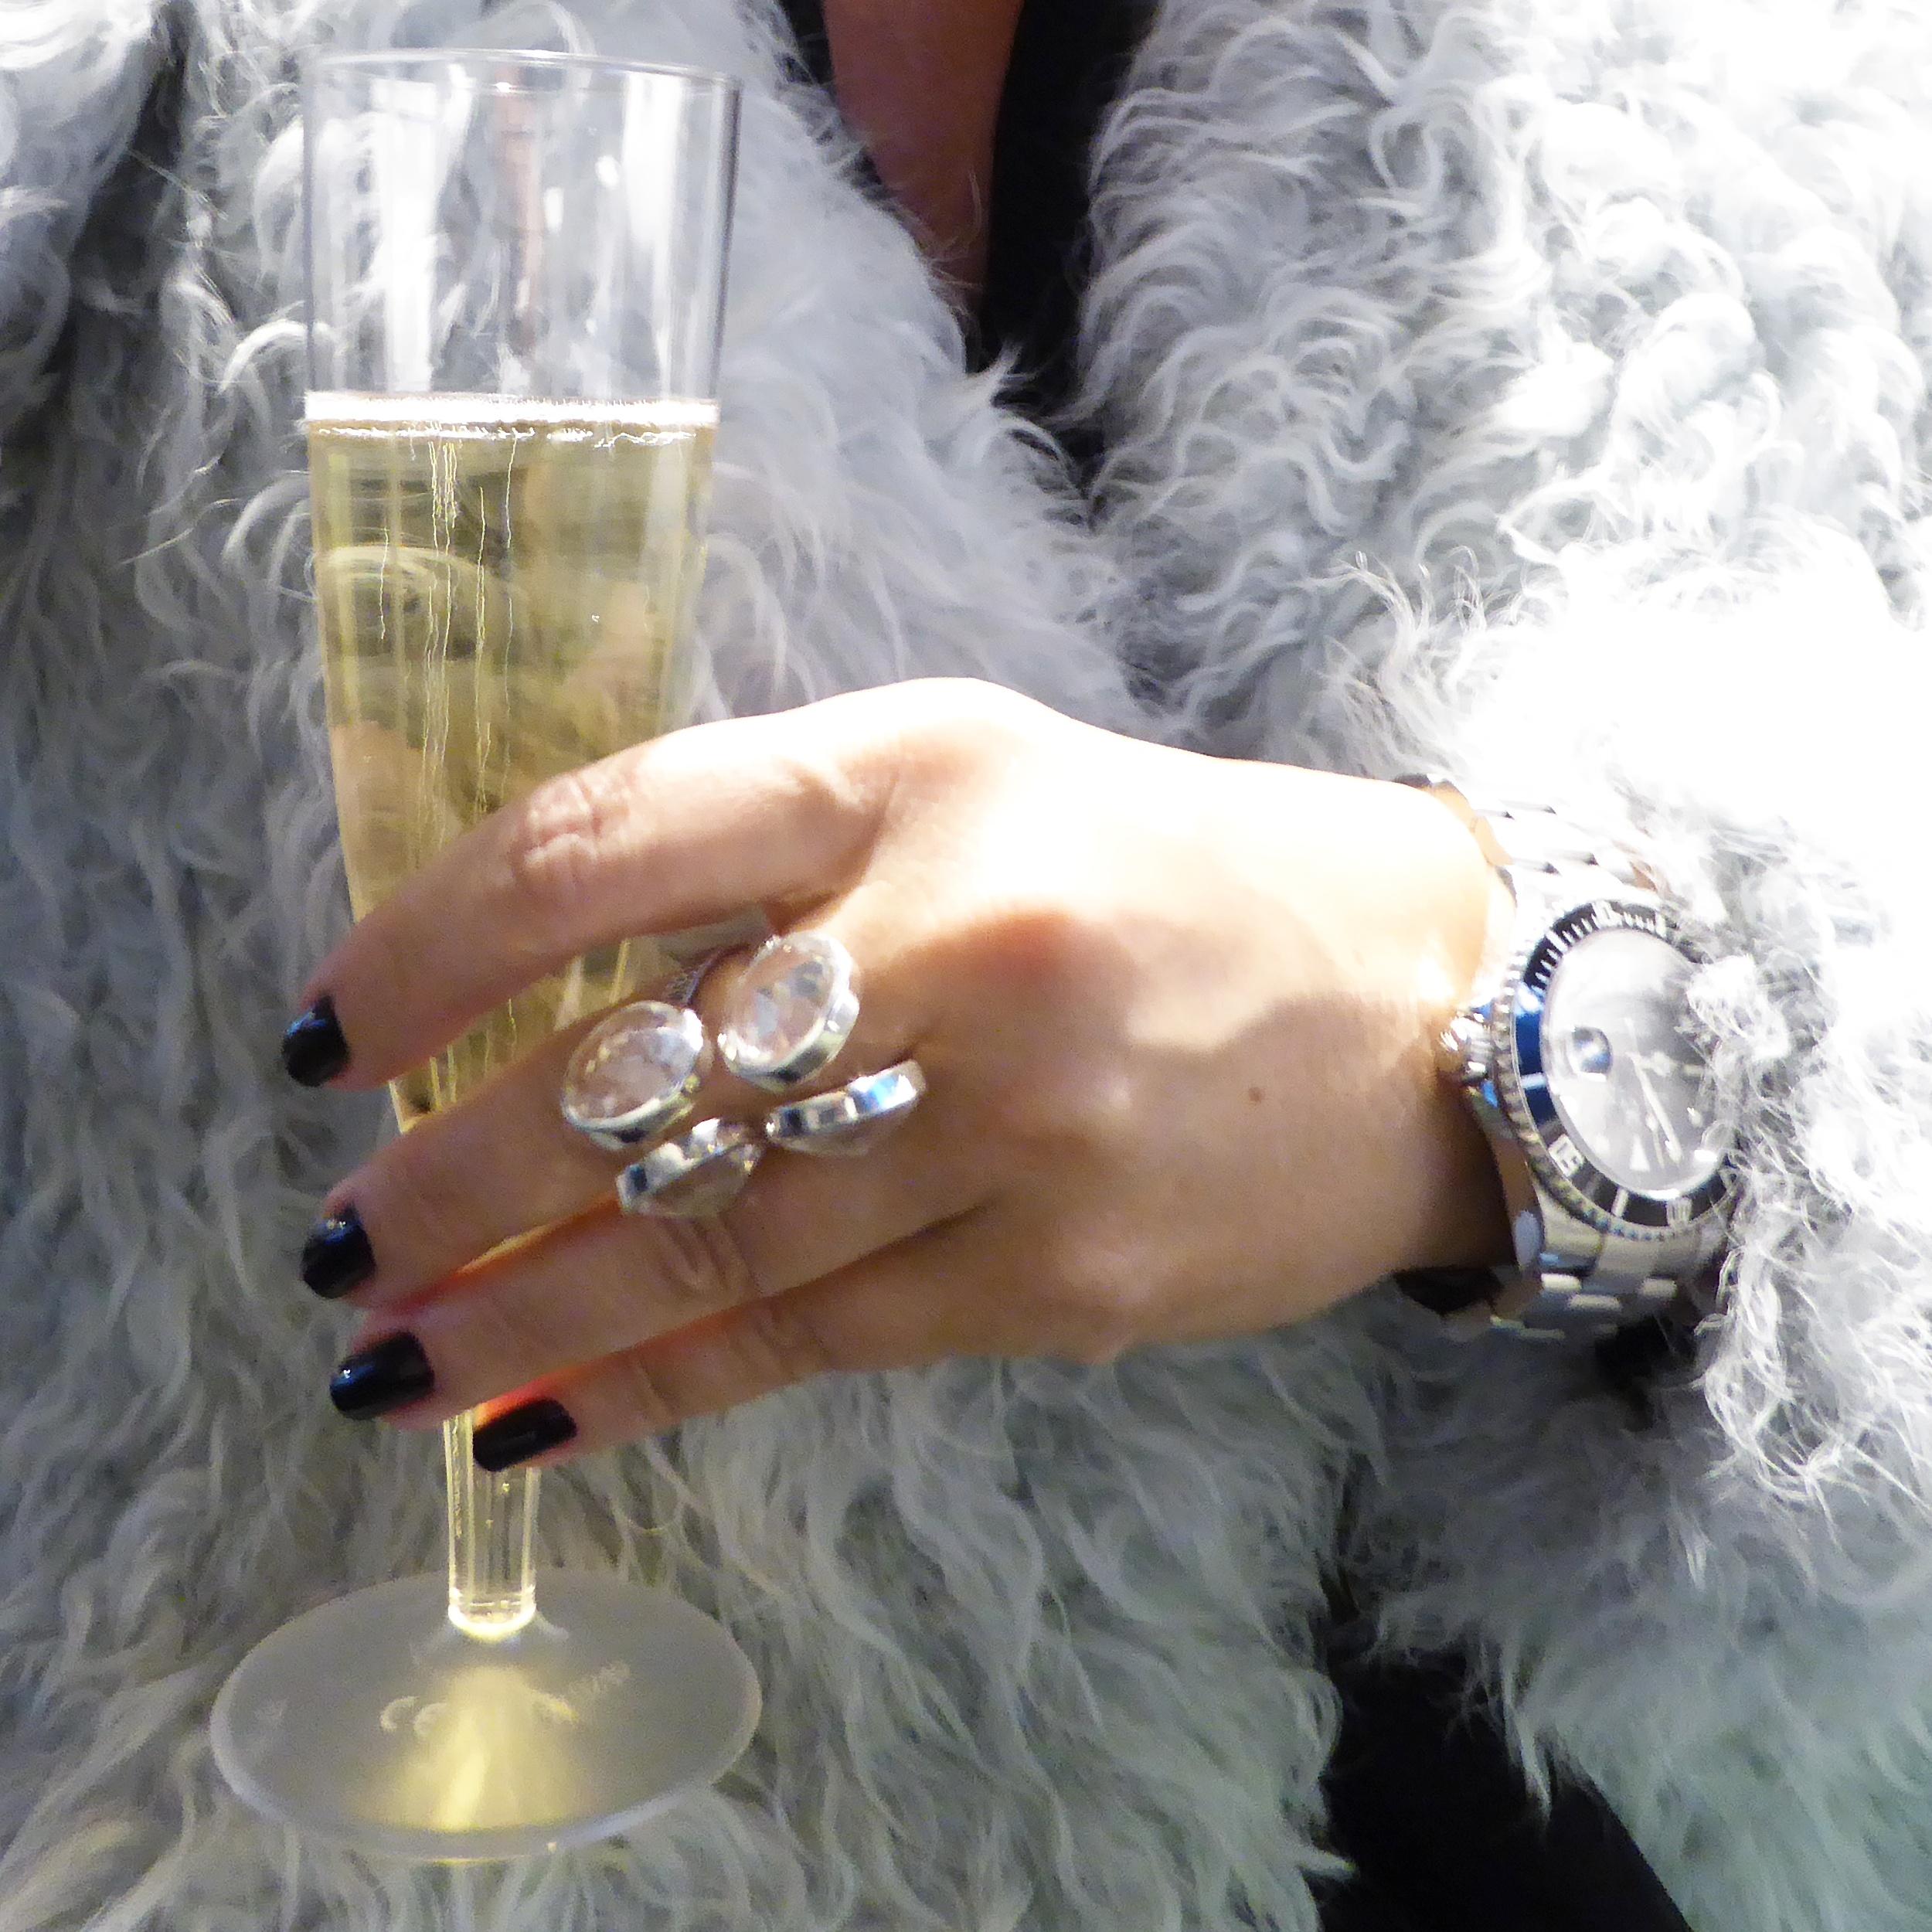 IMG 20150430 075654 Caroli Event My Life My Life Eddie Fischer Living a Style